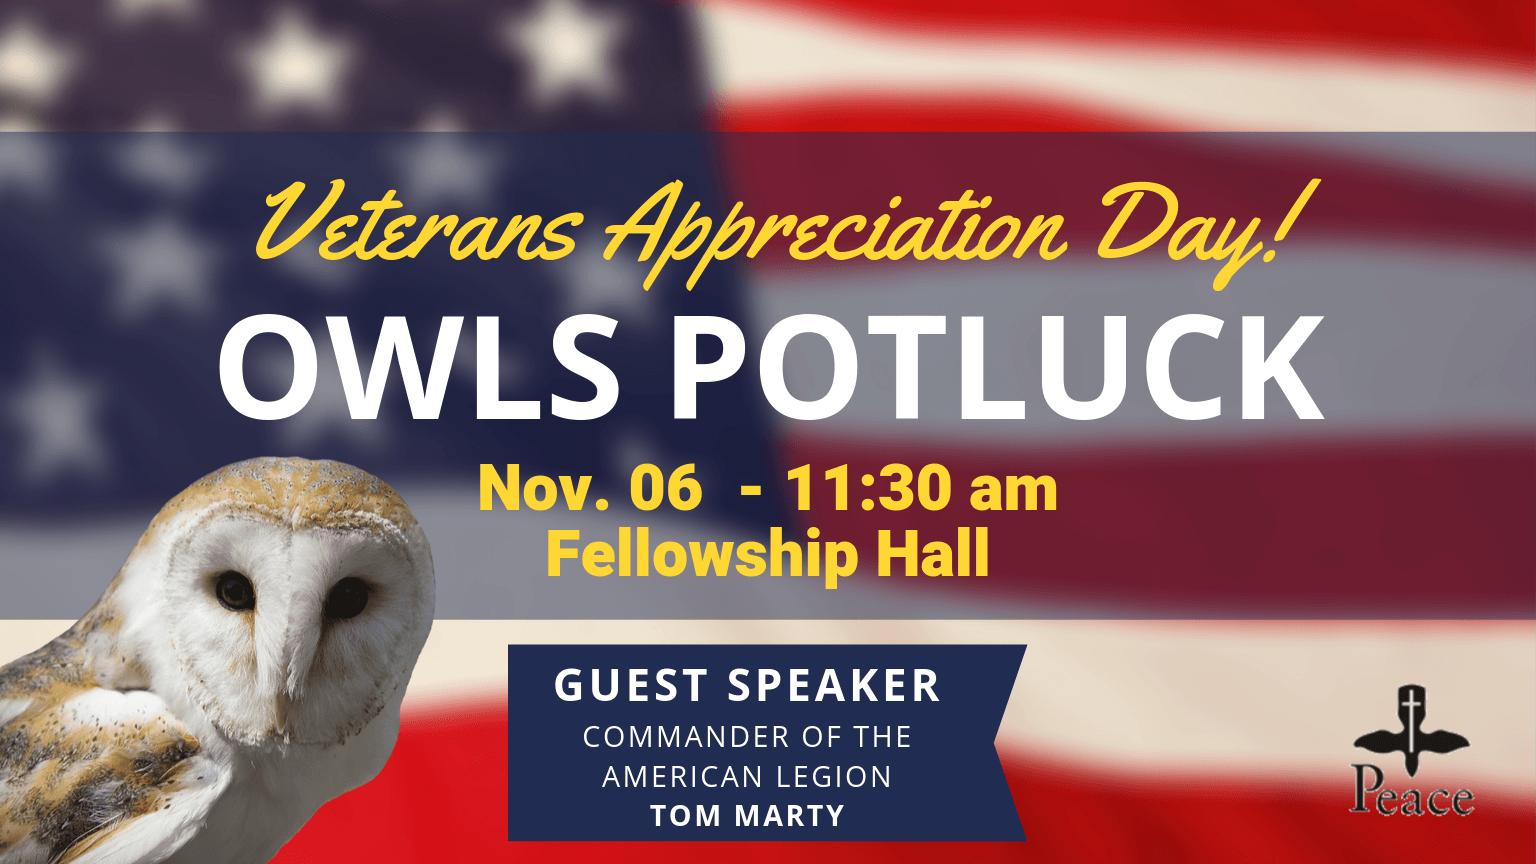 OWLs Potluck November 6 - 11:30am